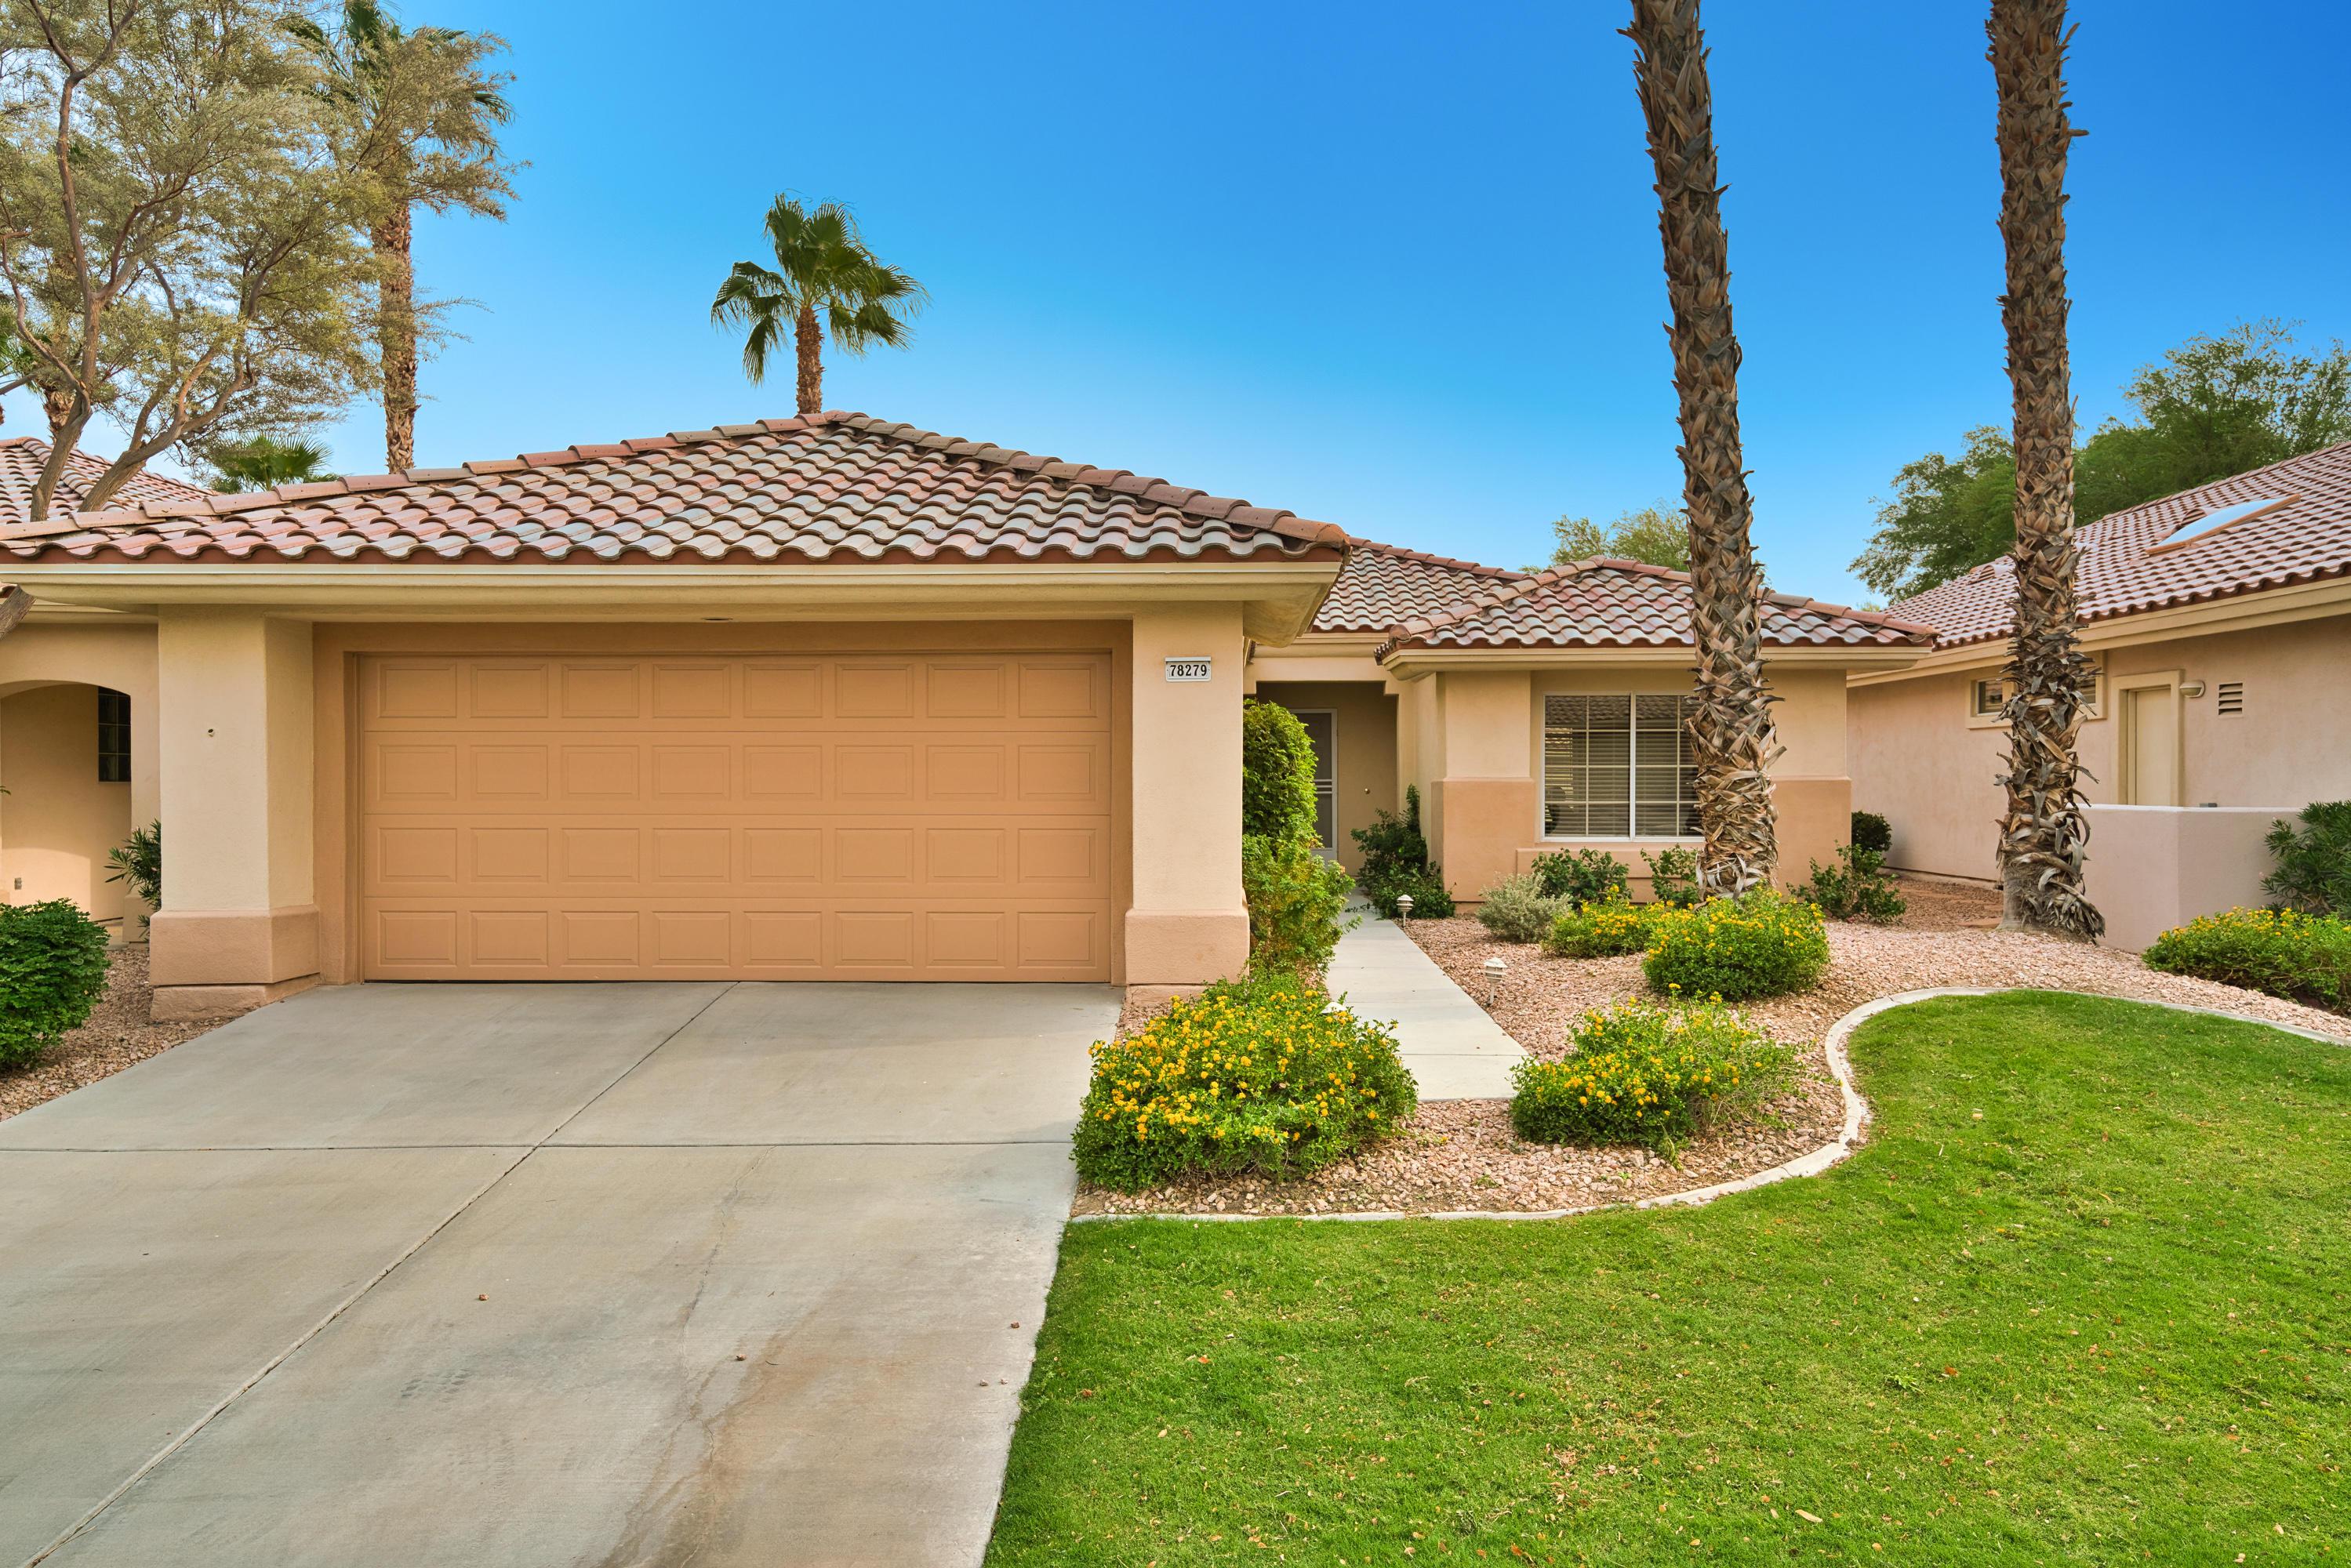 Photo of 78279 Yucca Blossom Drive, Palm Desert, CA 92211